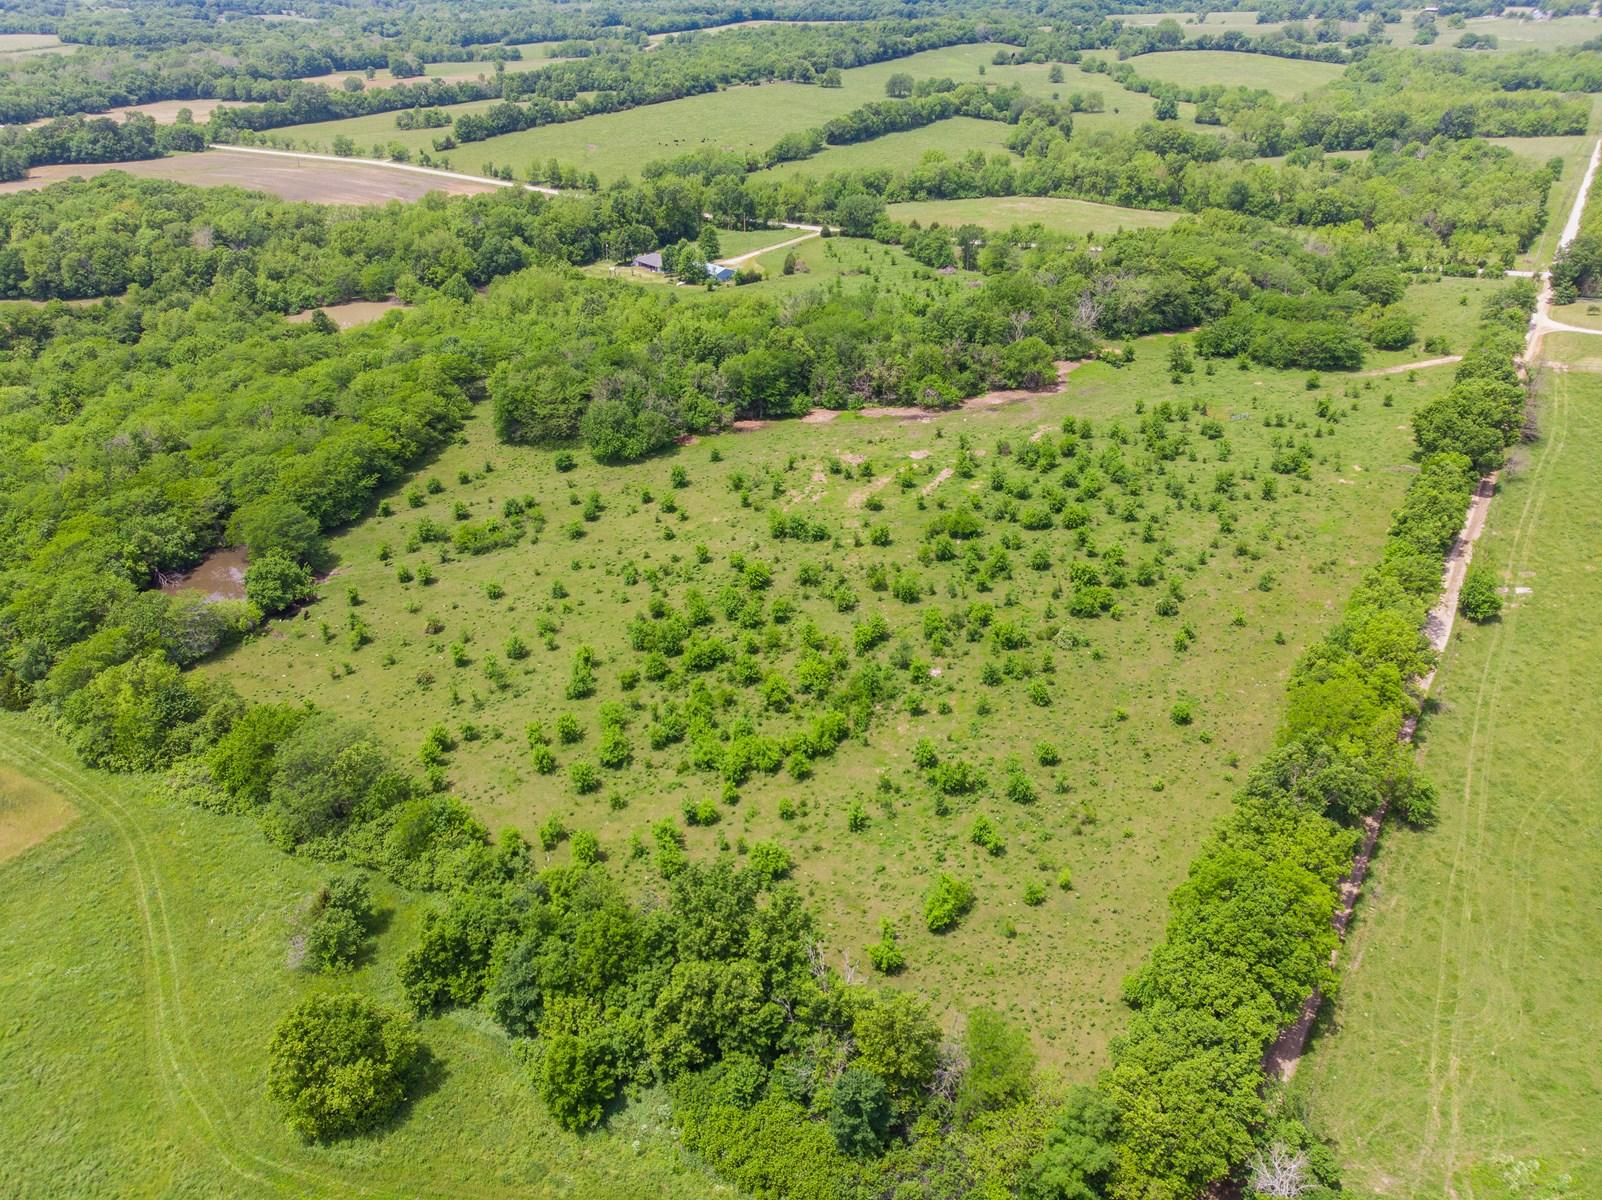 Missouri Rural Land For Sale